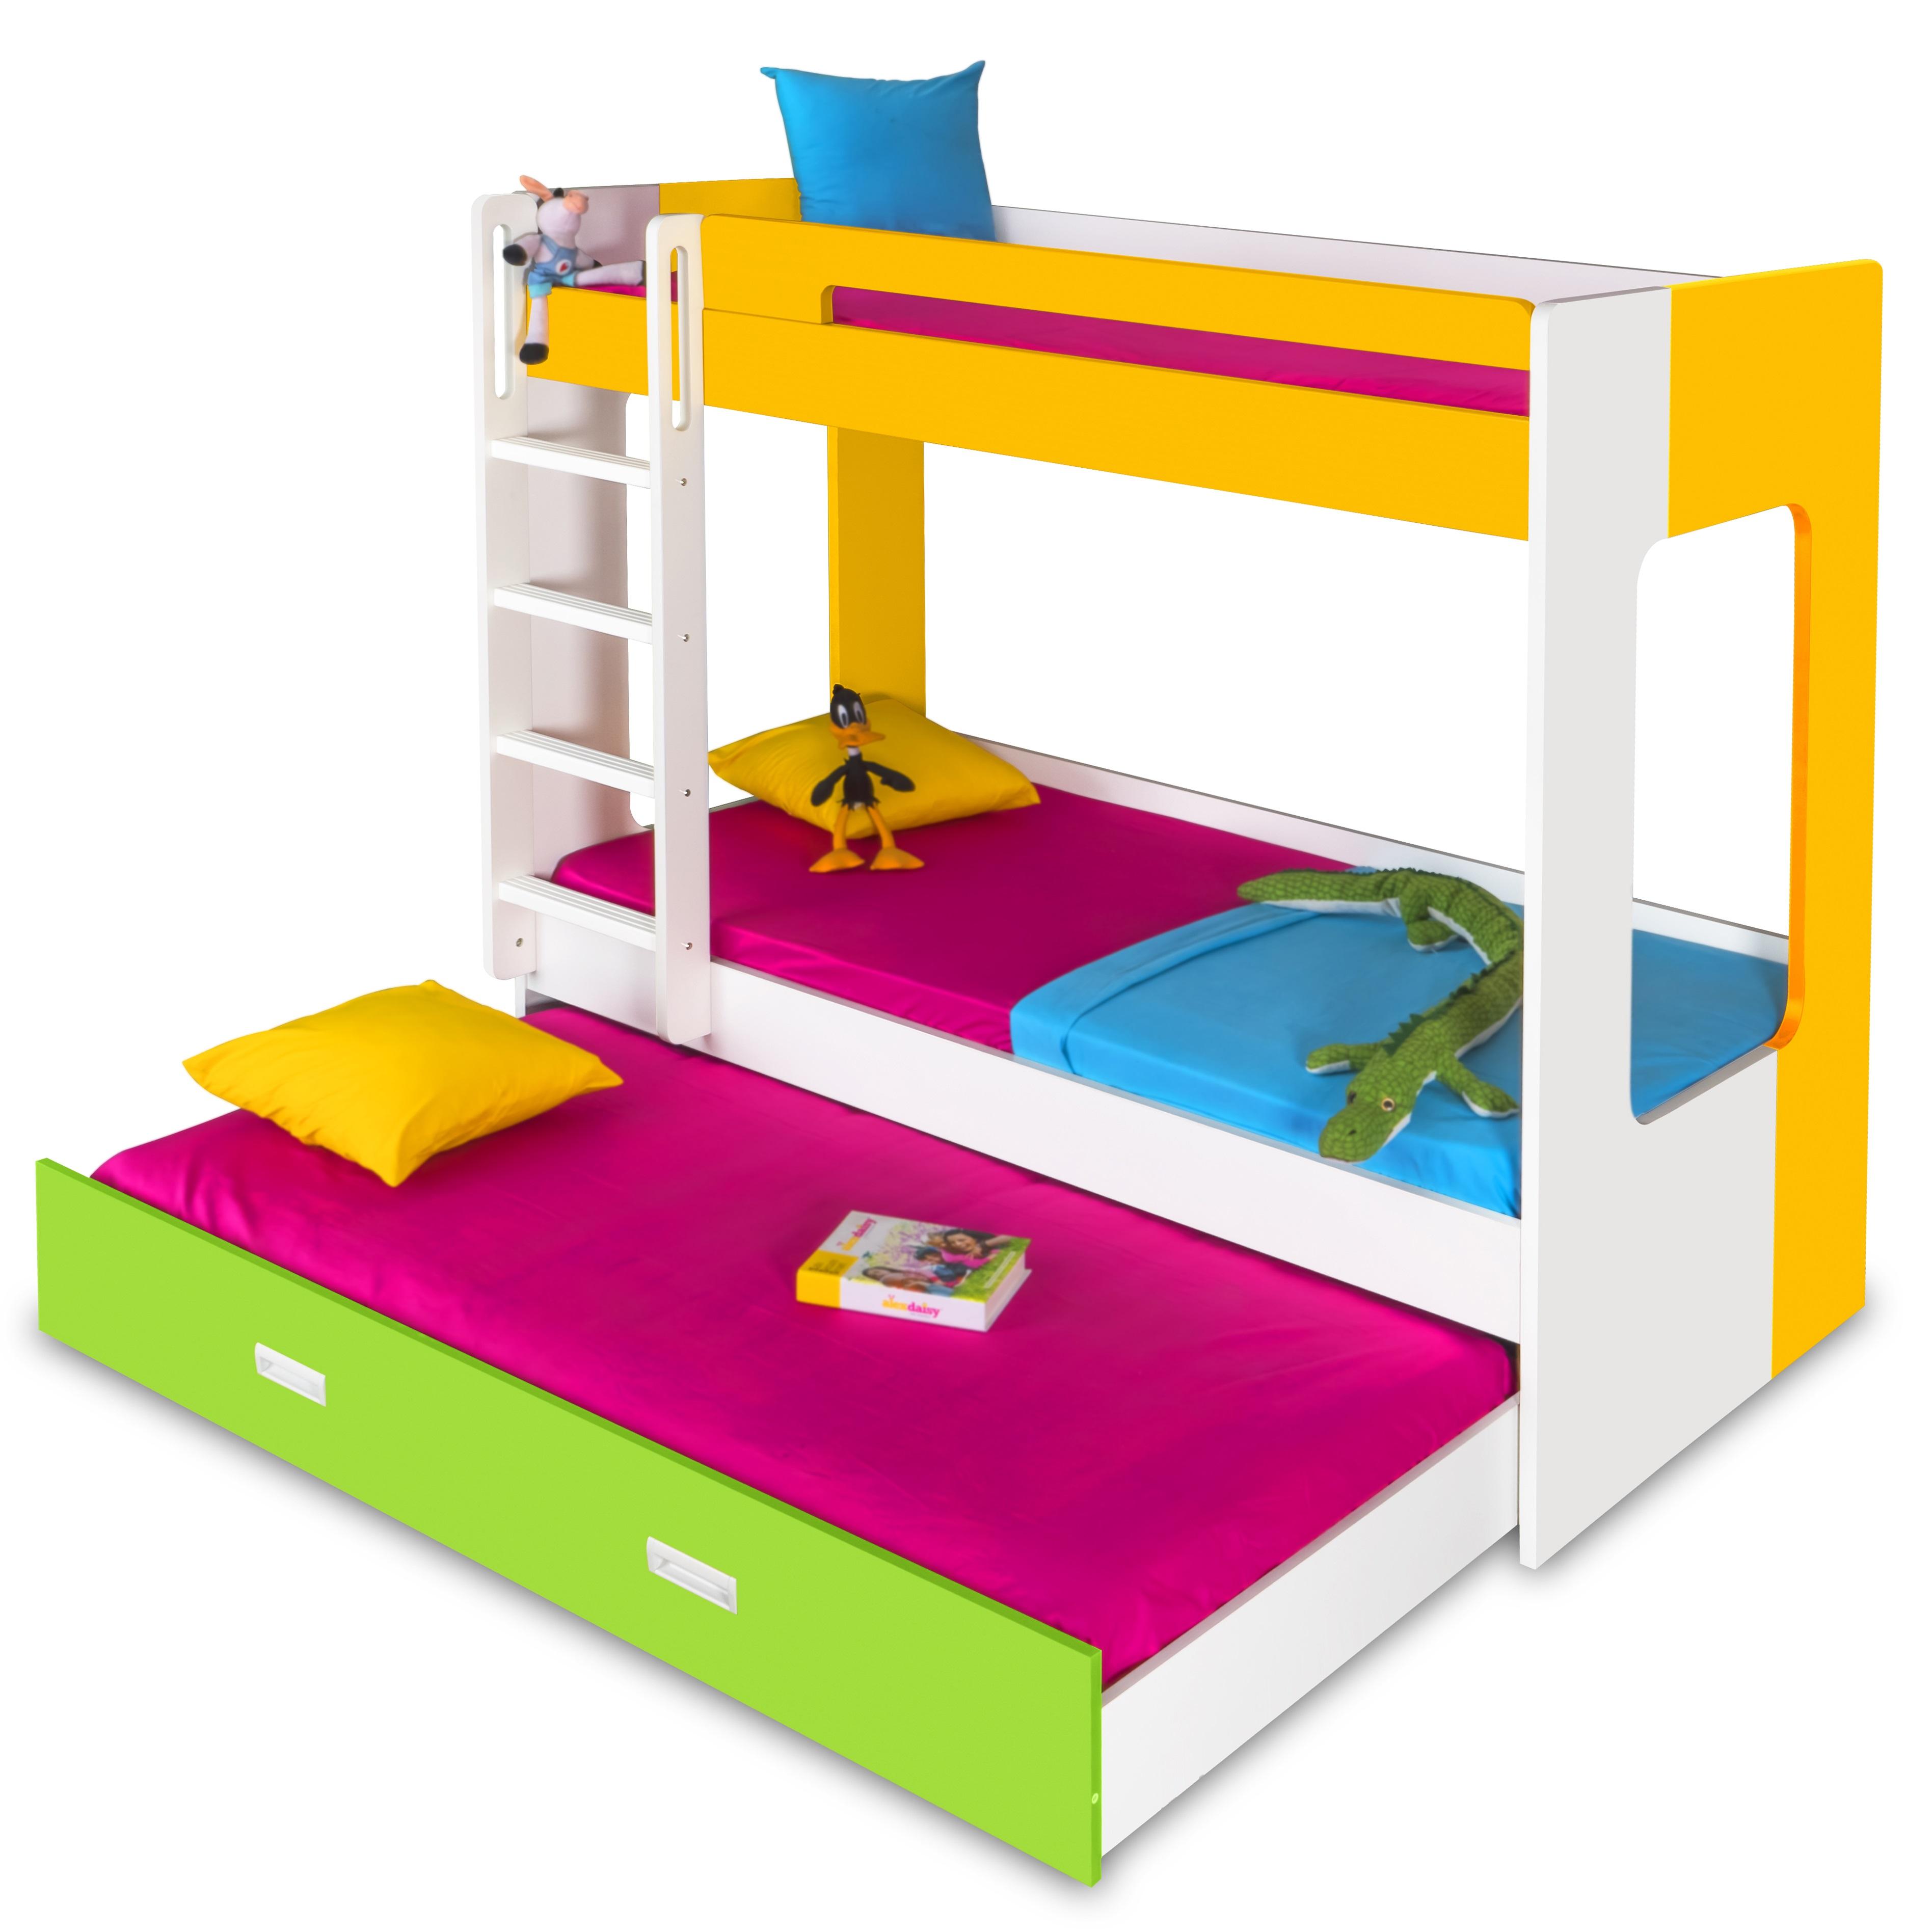 manhattan bunk bed yellow white green. Black Bedroom Furniture Sets. Home Design Ideas